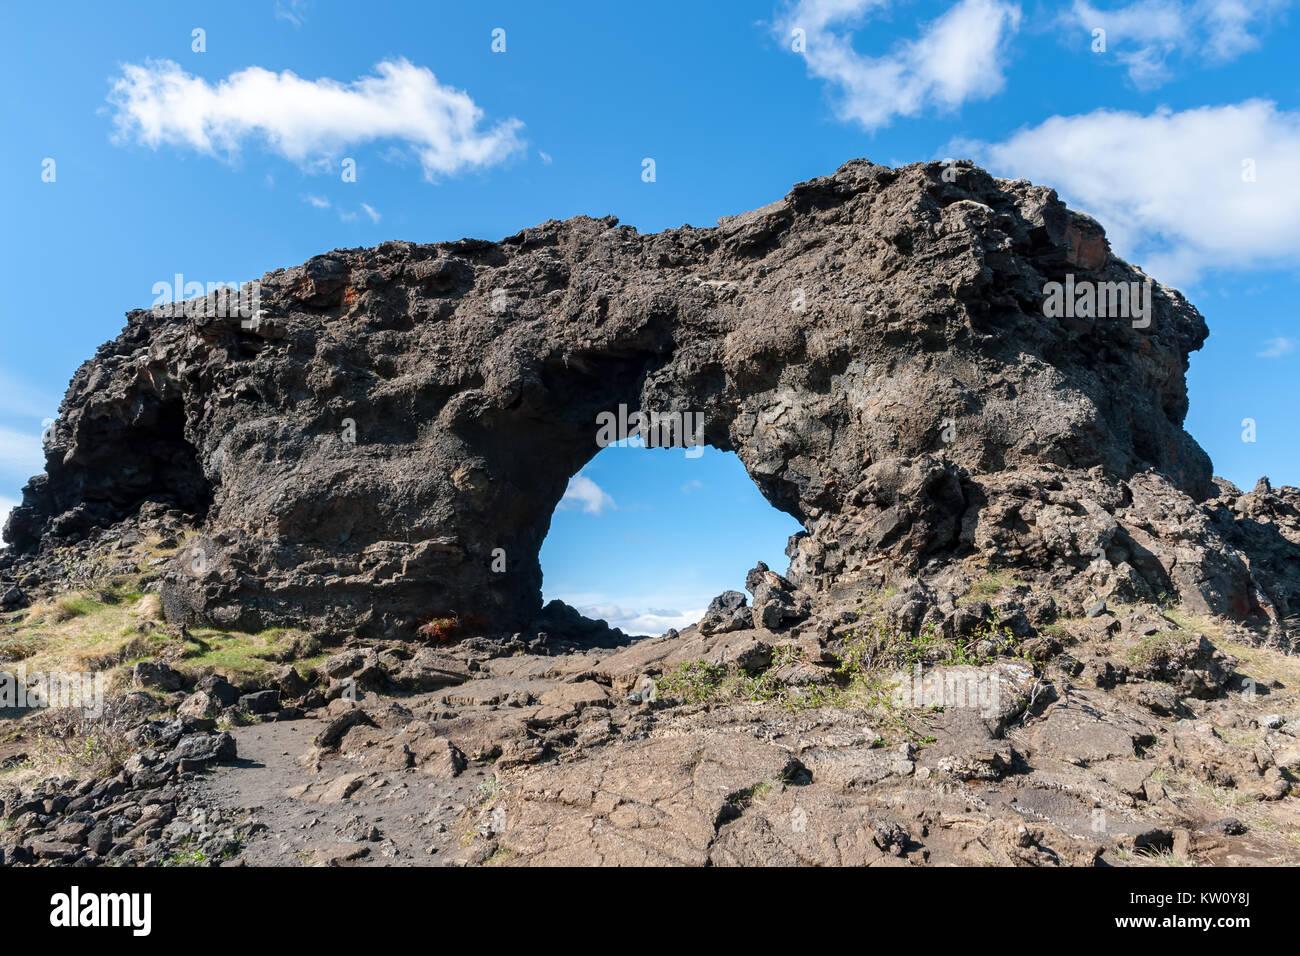 Lava window at Dimmuborgir, Myvatn area - Iceland - Stock Image